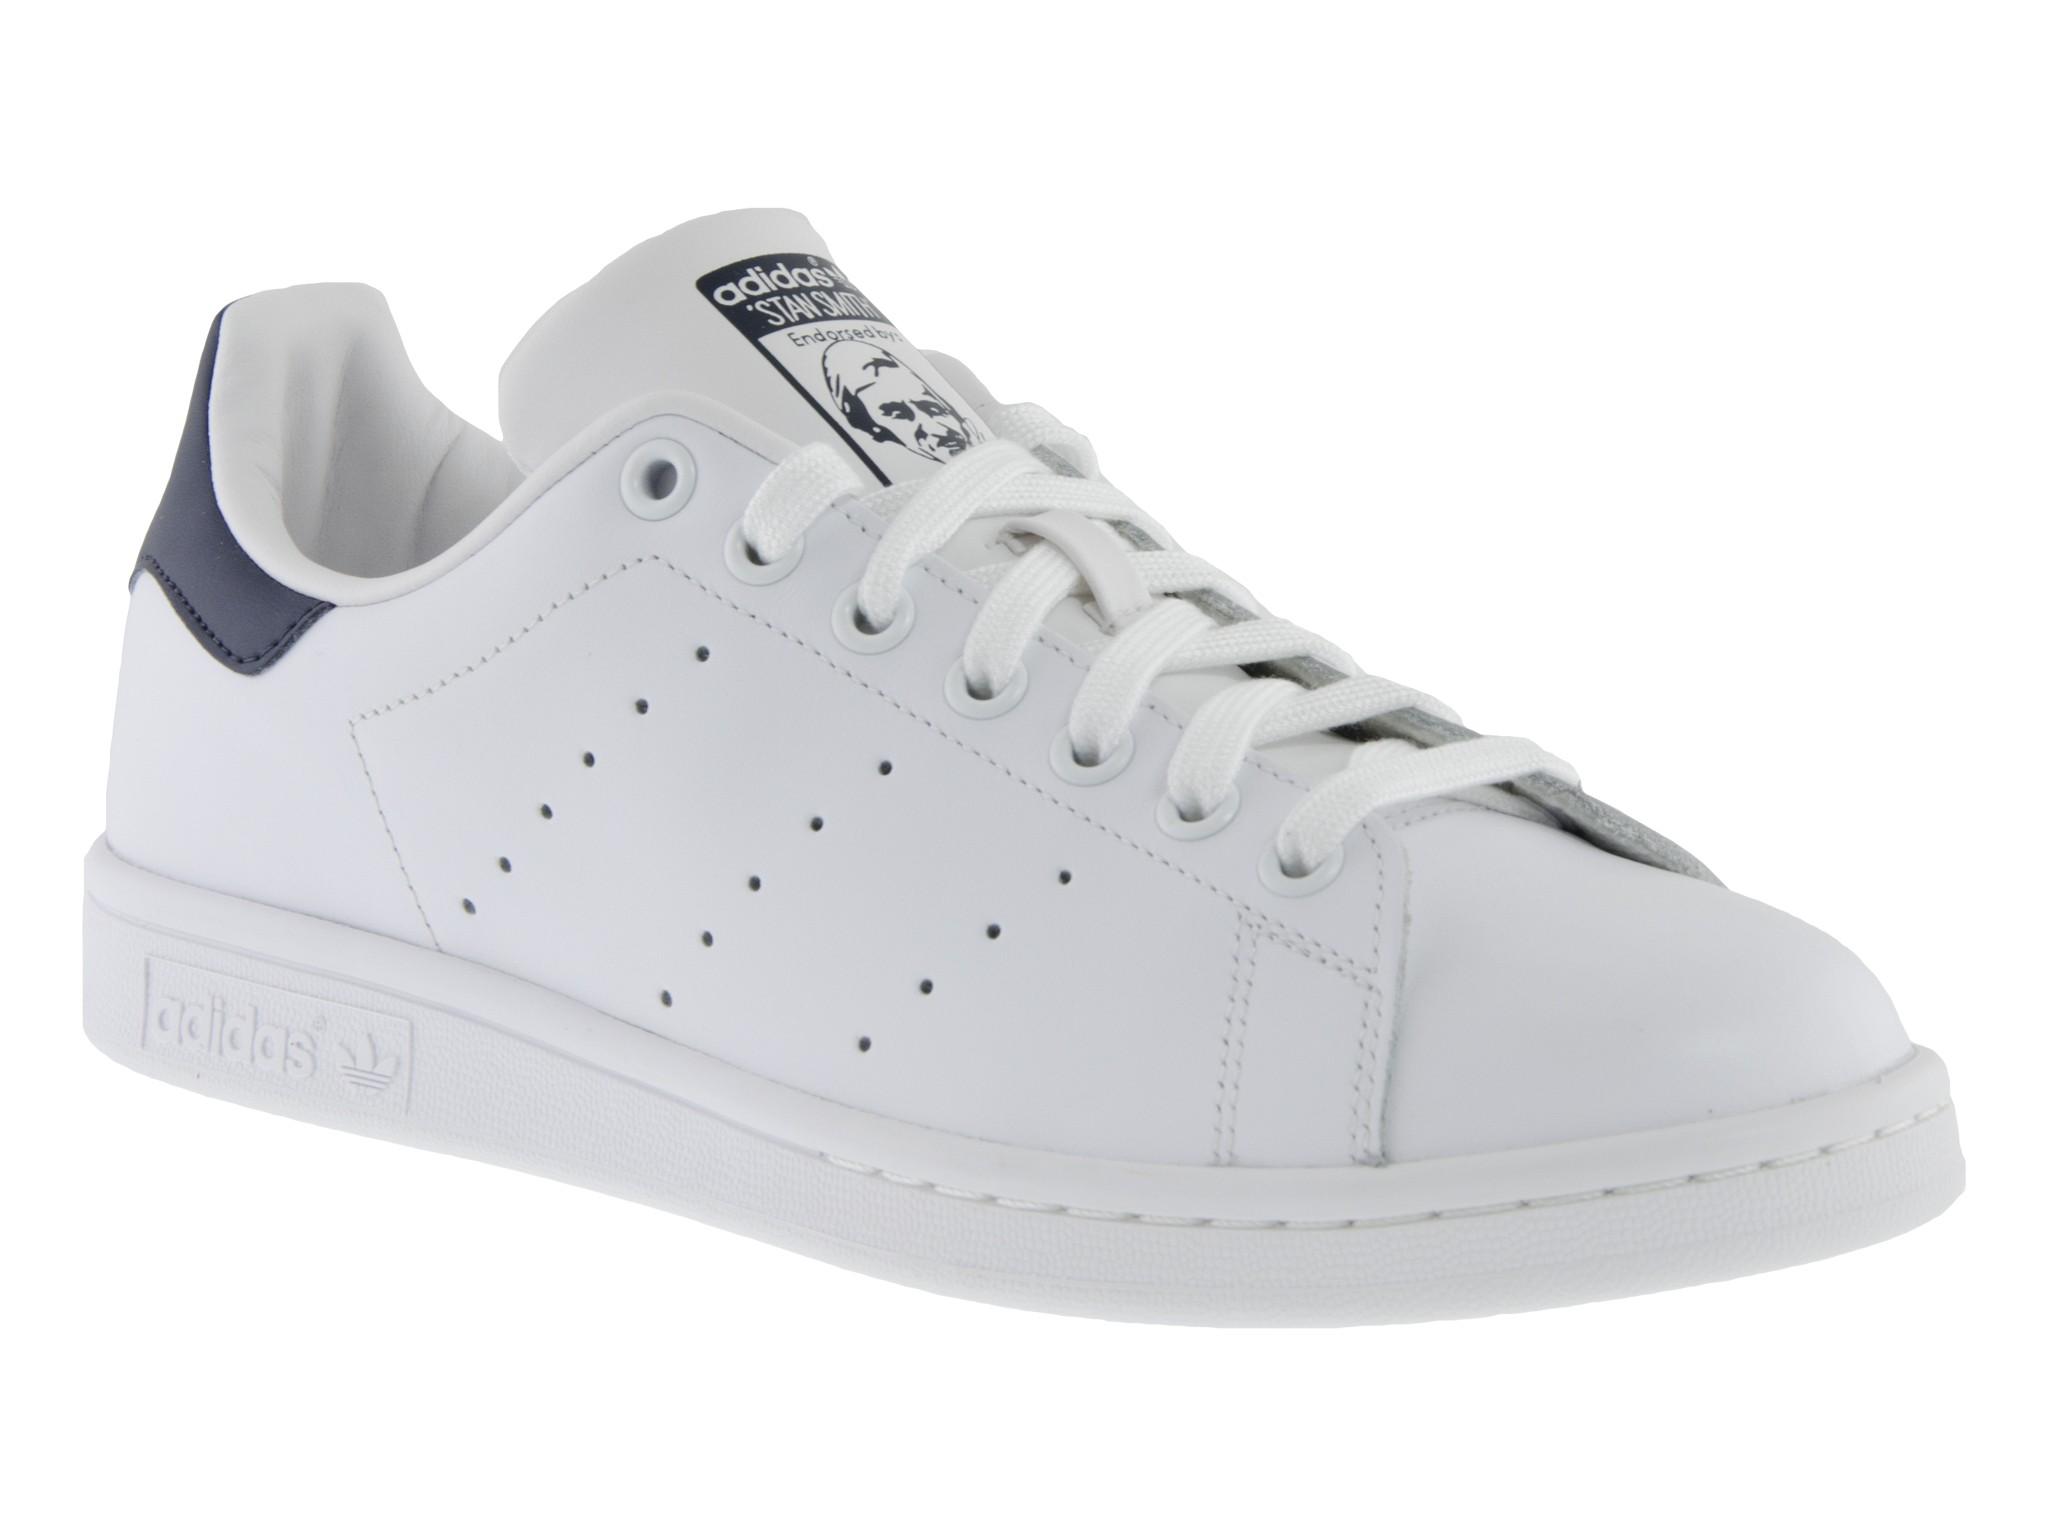 Scarpe Adidas Stan Smith uomo bianco e blu